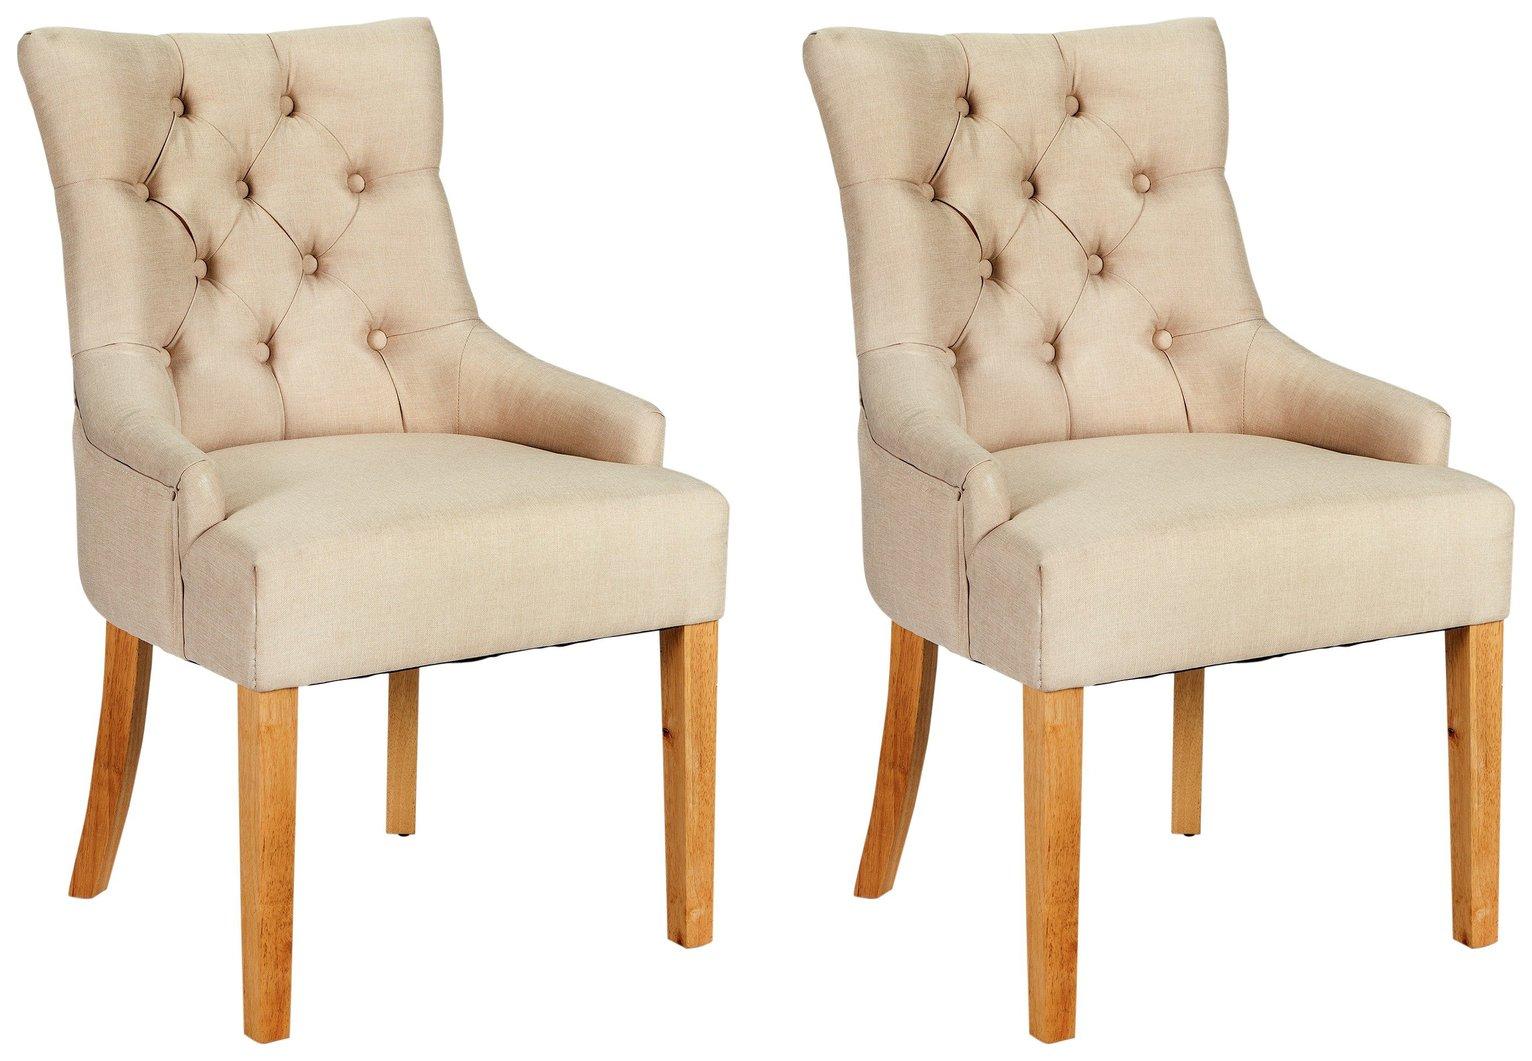 Argos Home Pair of Cherwell Dining Chairs - Cream